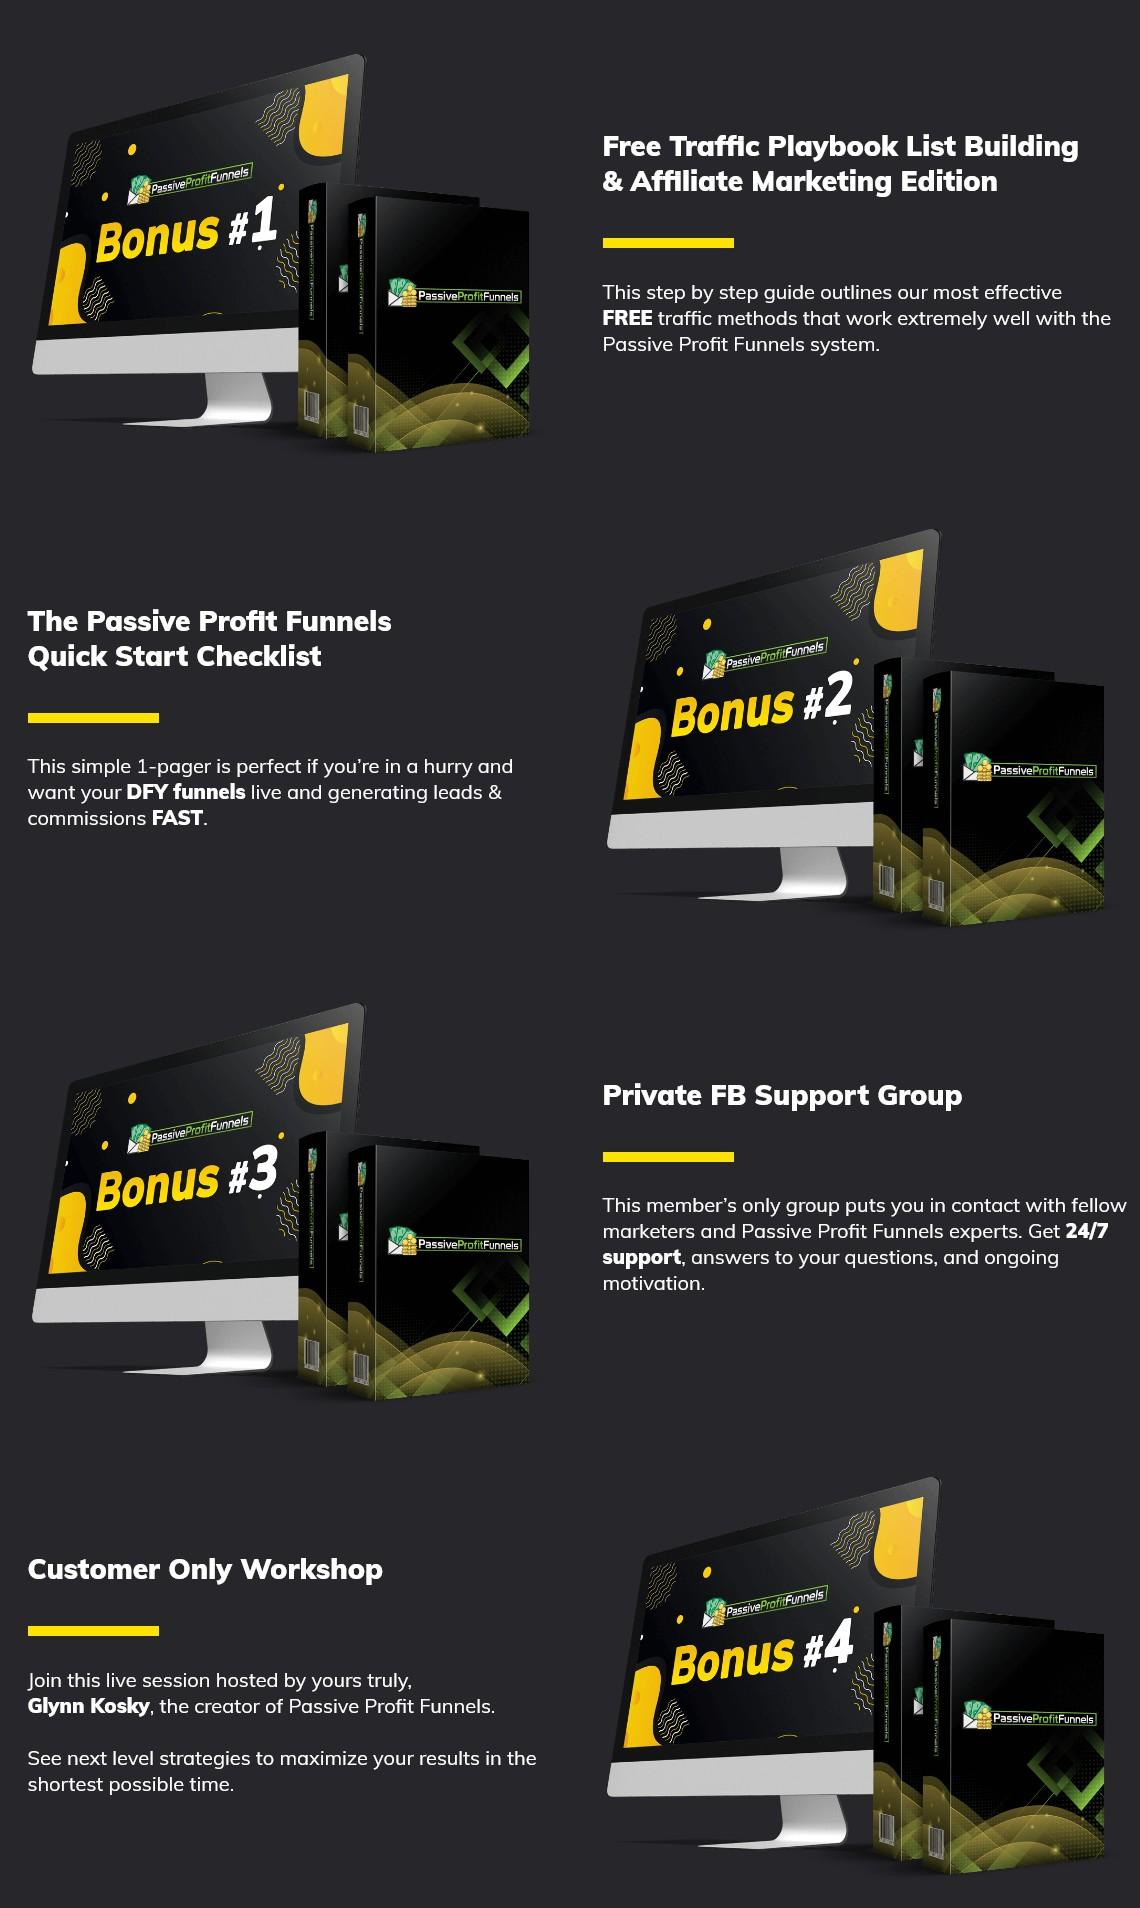 Passive-Profit-Funnels-bonus